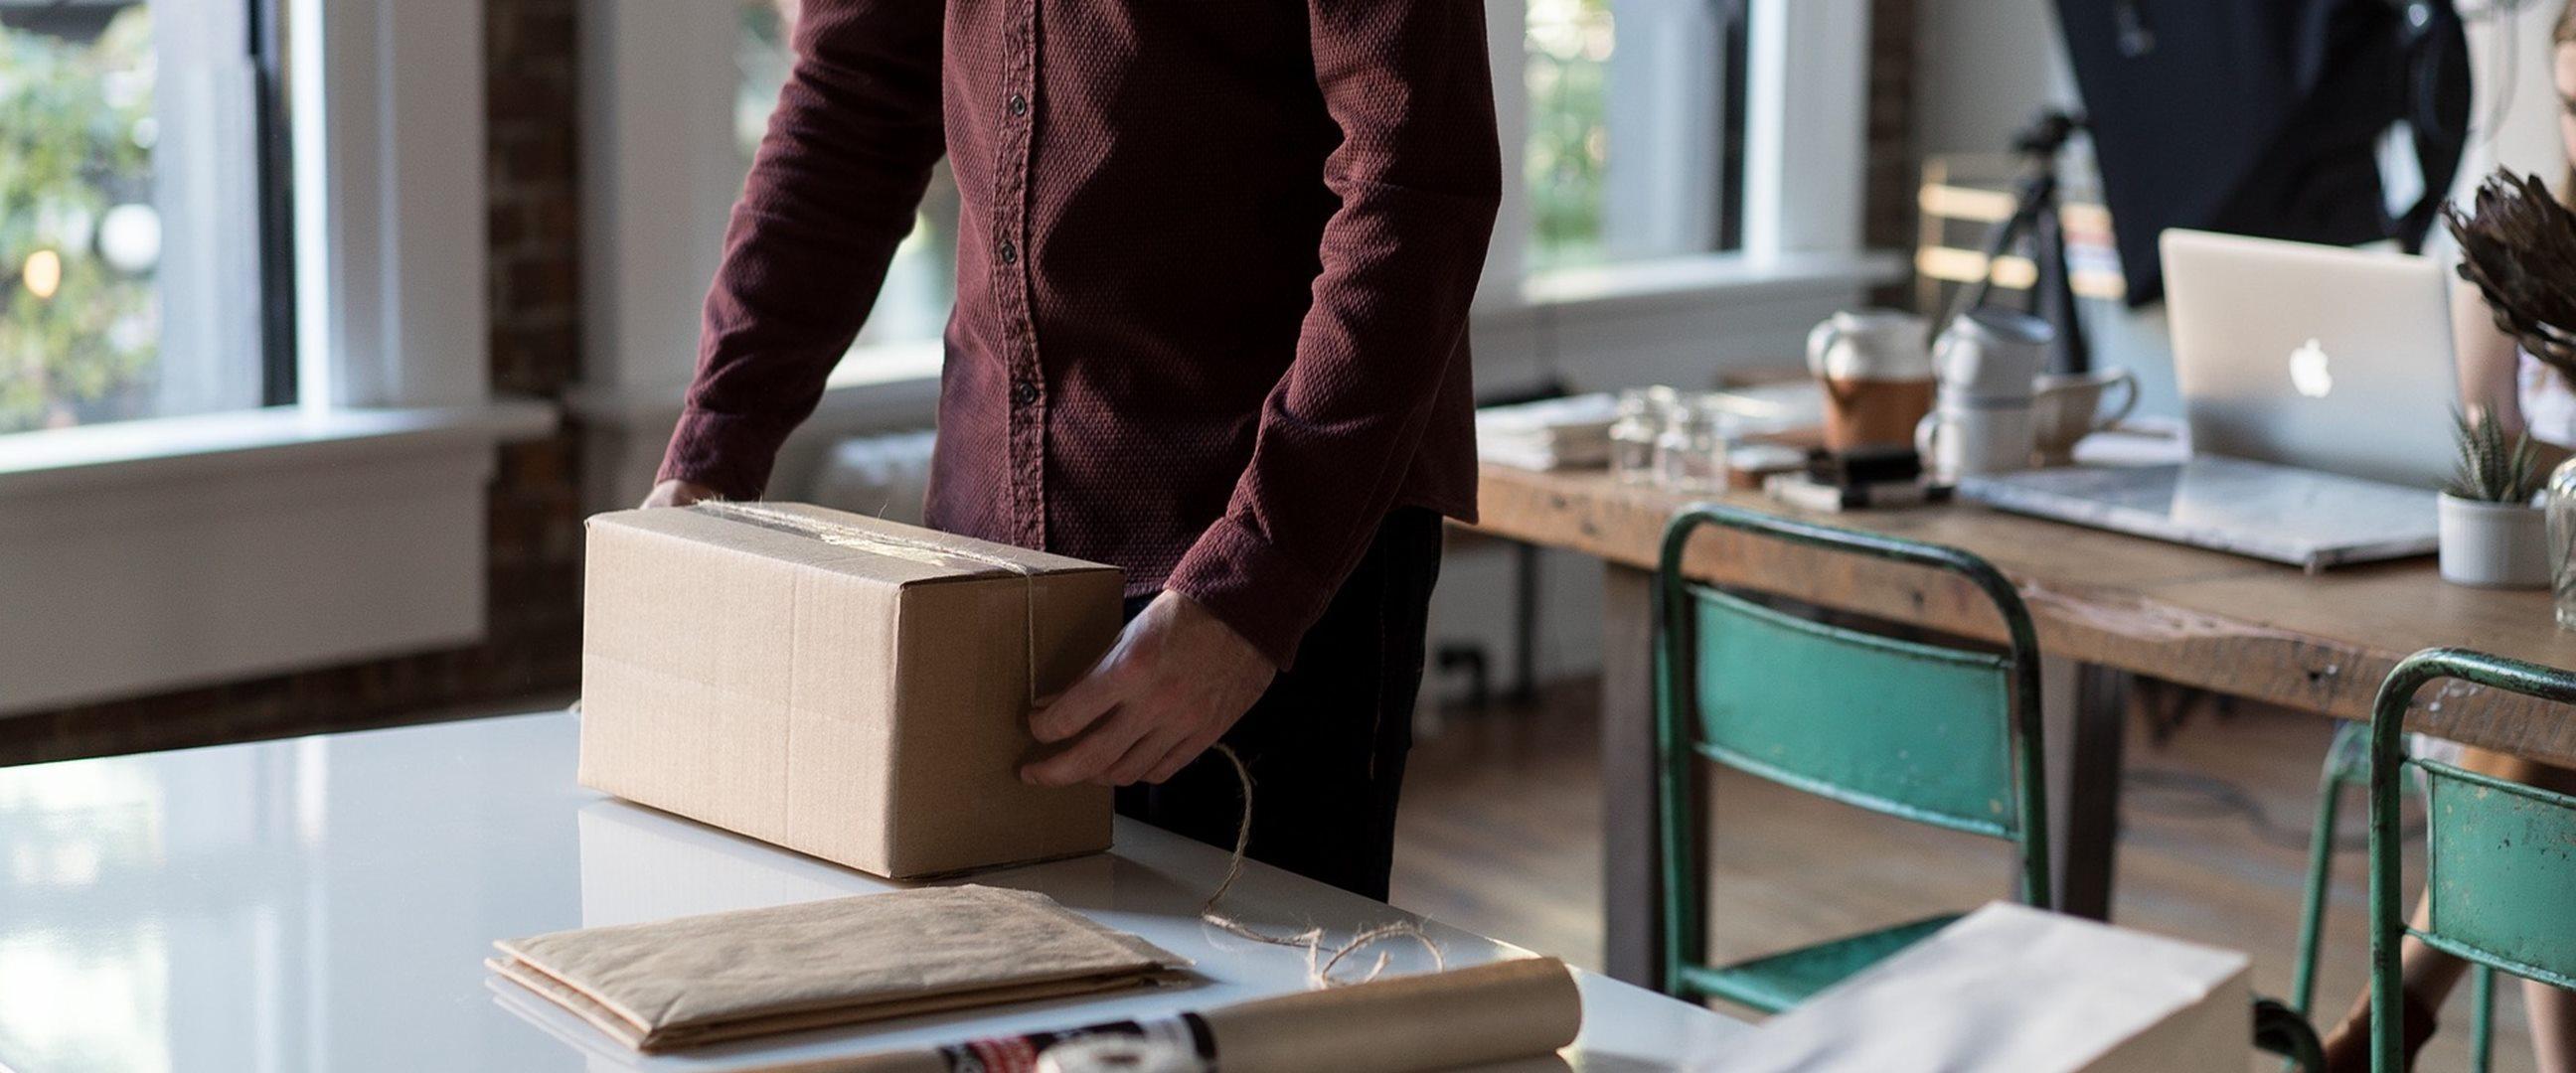 5 Cara mudah dan aman unboxing paket selama Corona mewabah